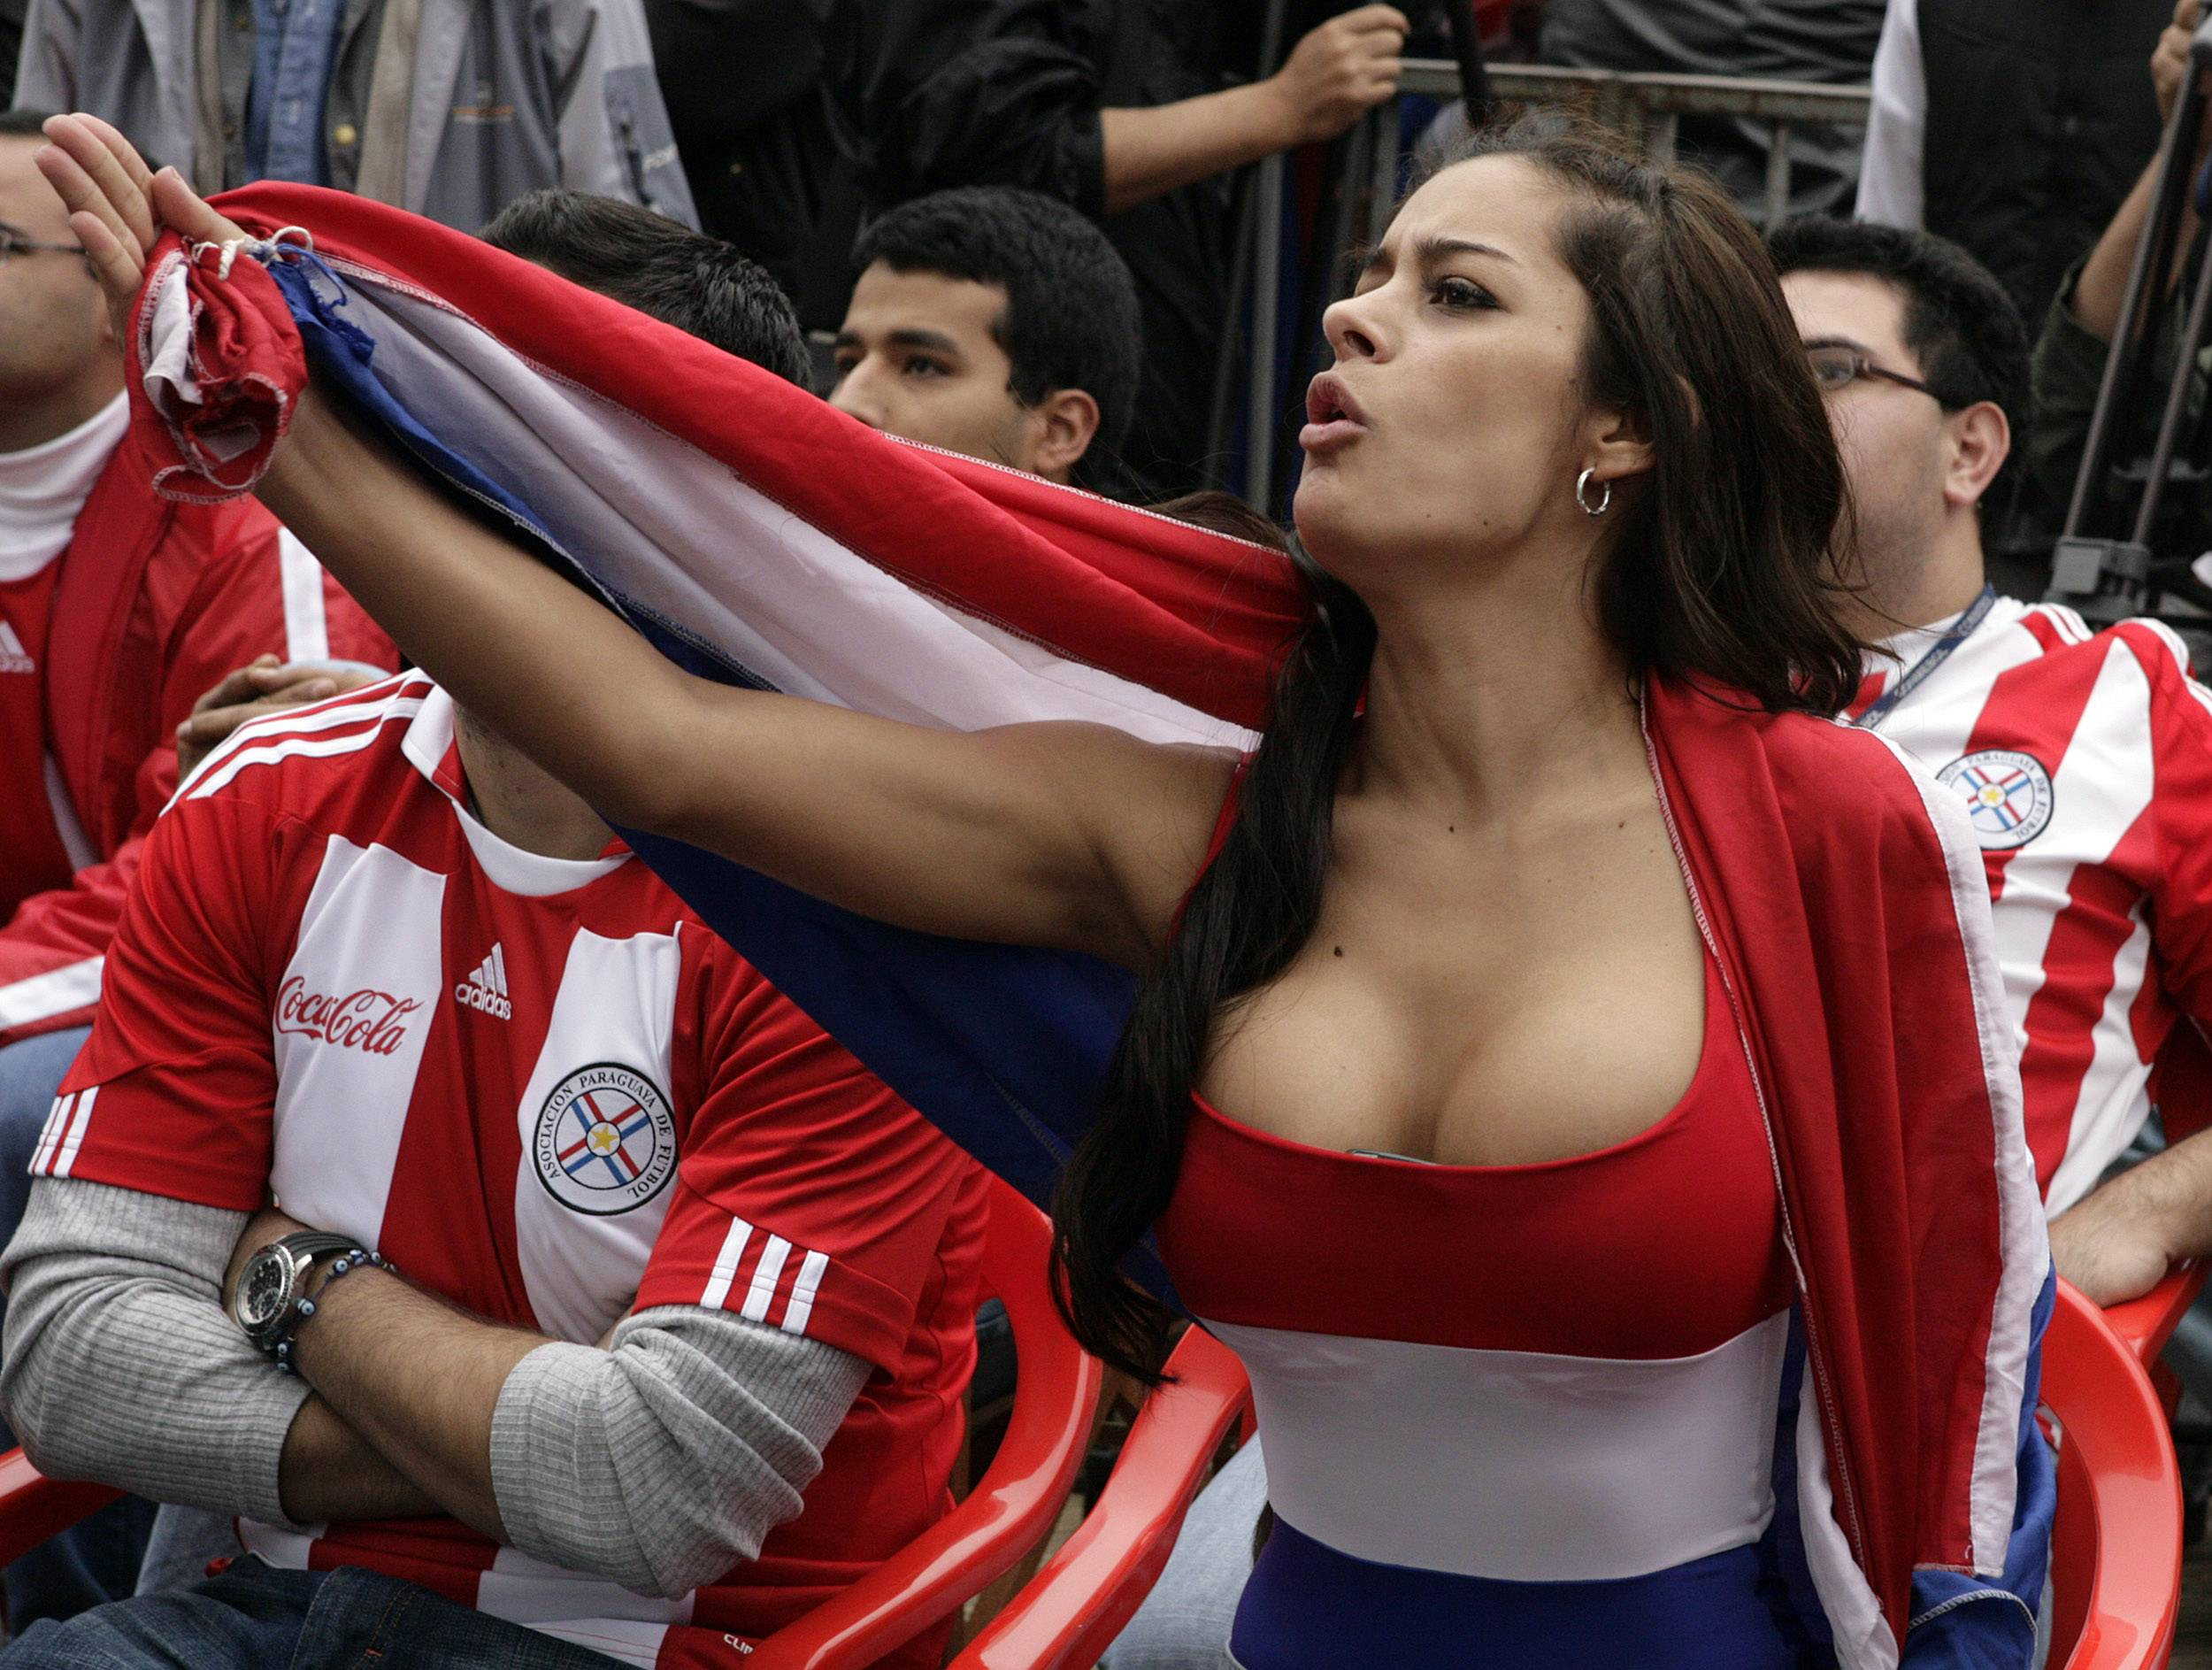 Erica fontes and jasmine jae on world cup uk team tits